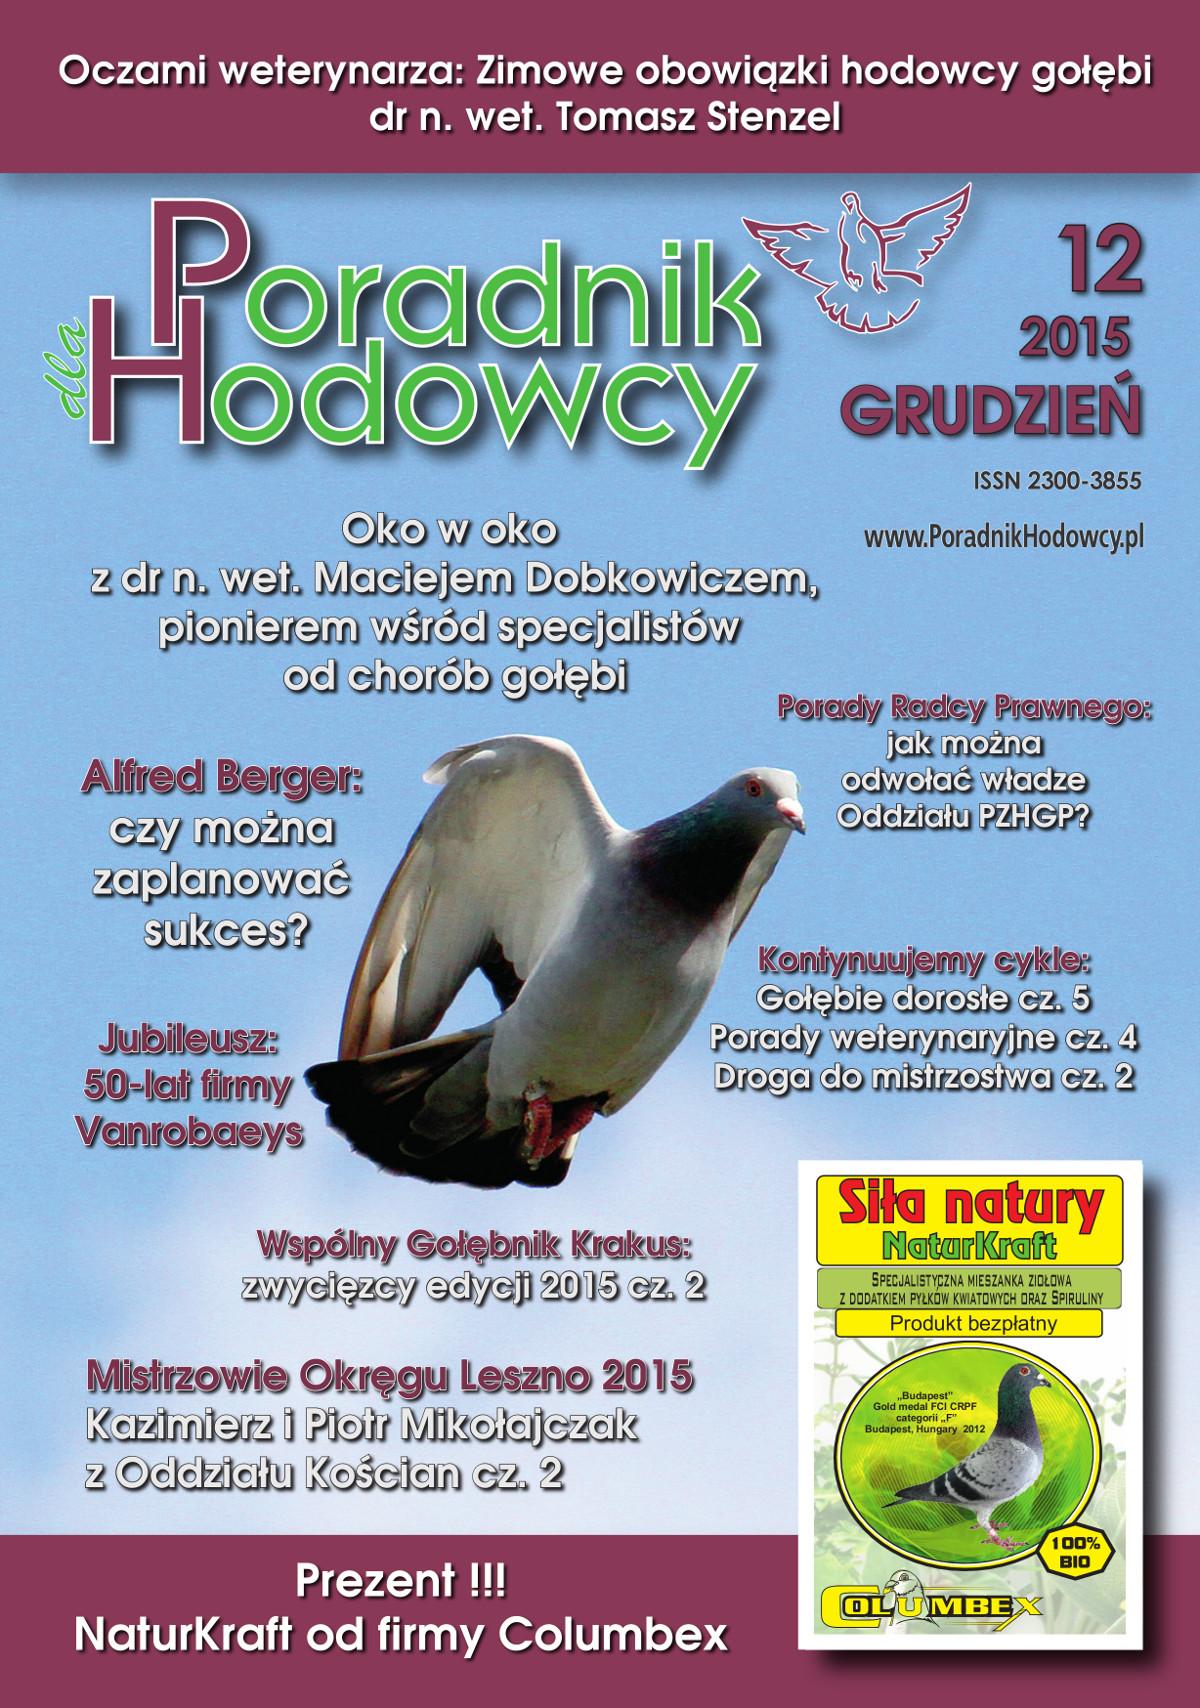 Okładka Poradnika Hodowcy numer grudzień 2015